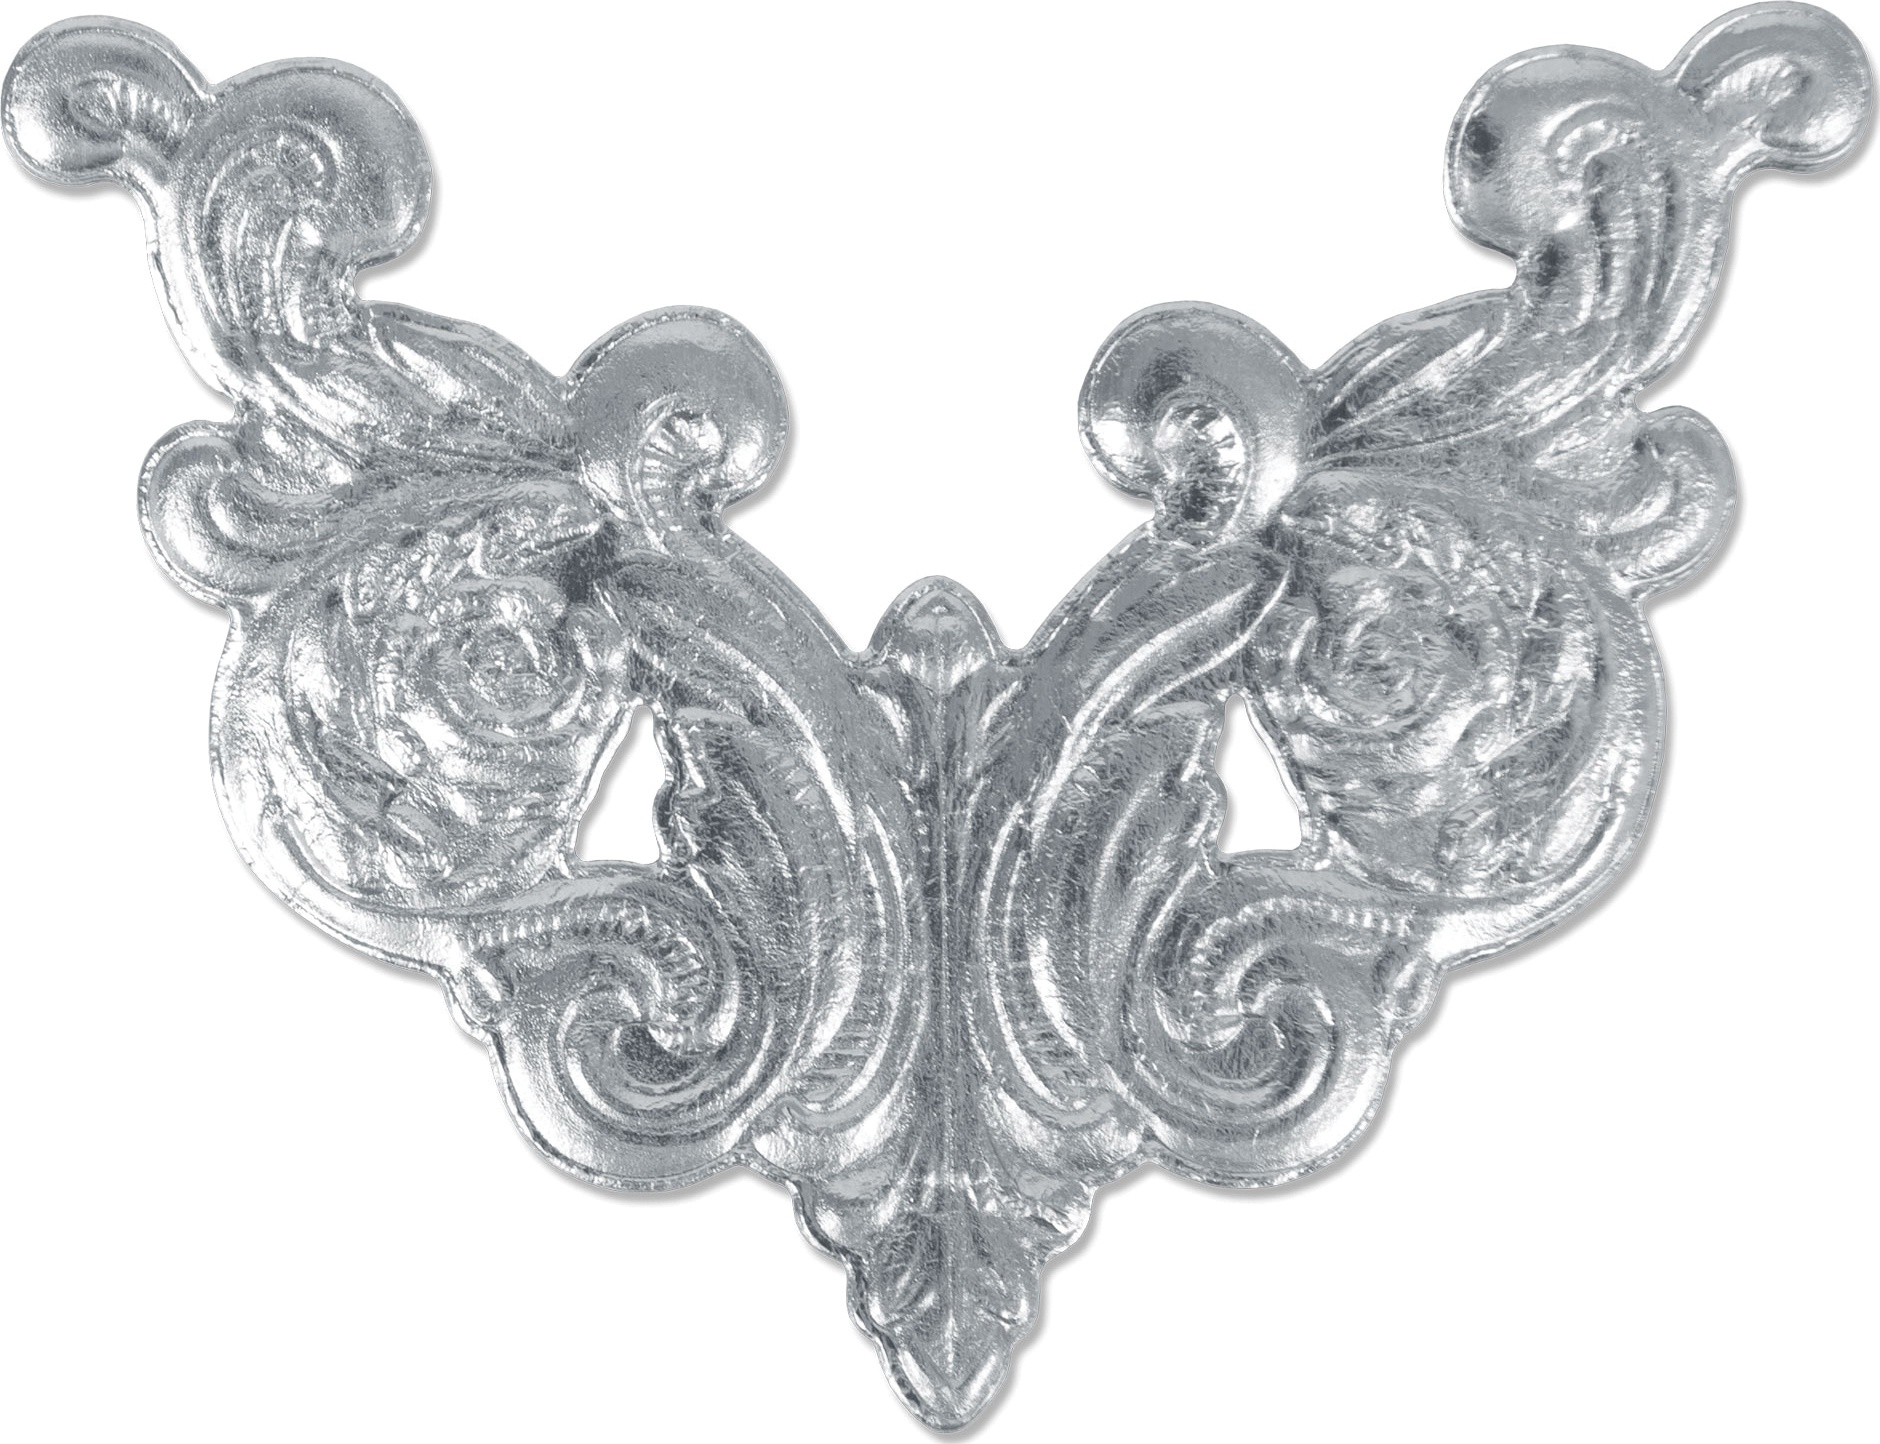 Fanciful 3D Impresslits Embossing Folder